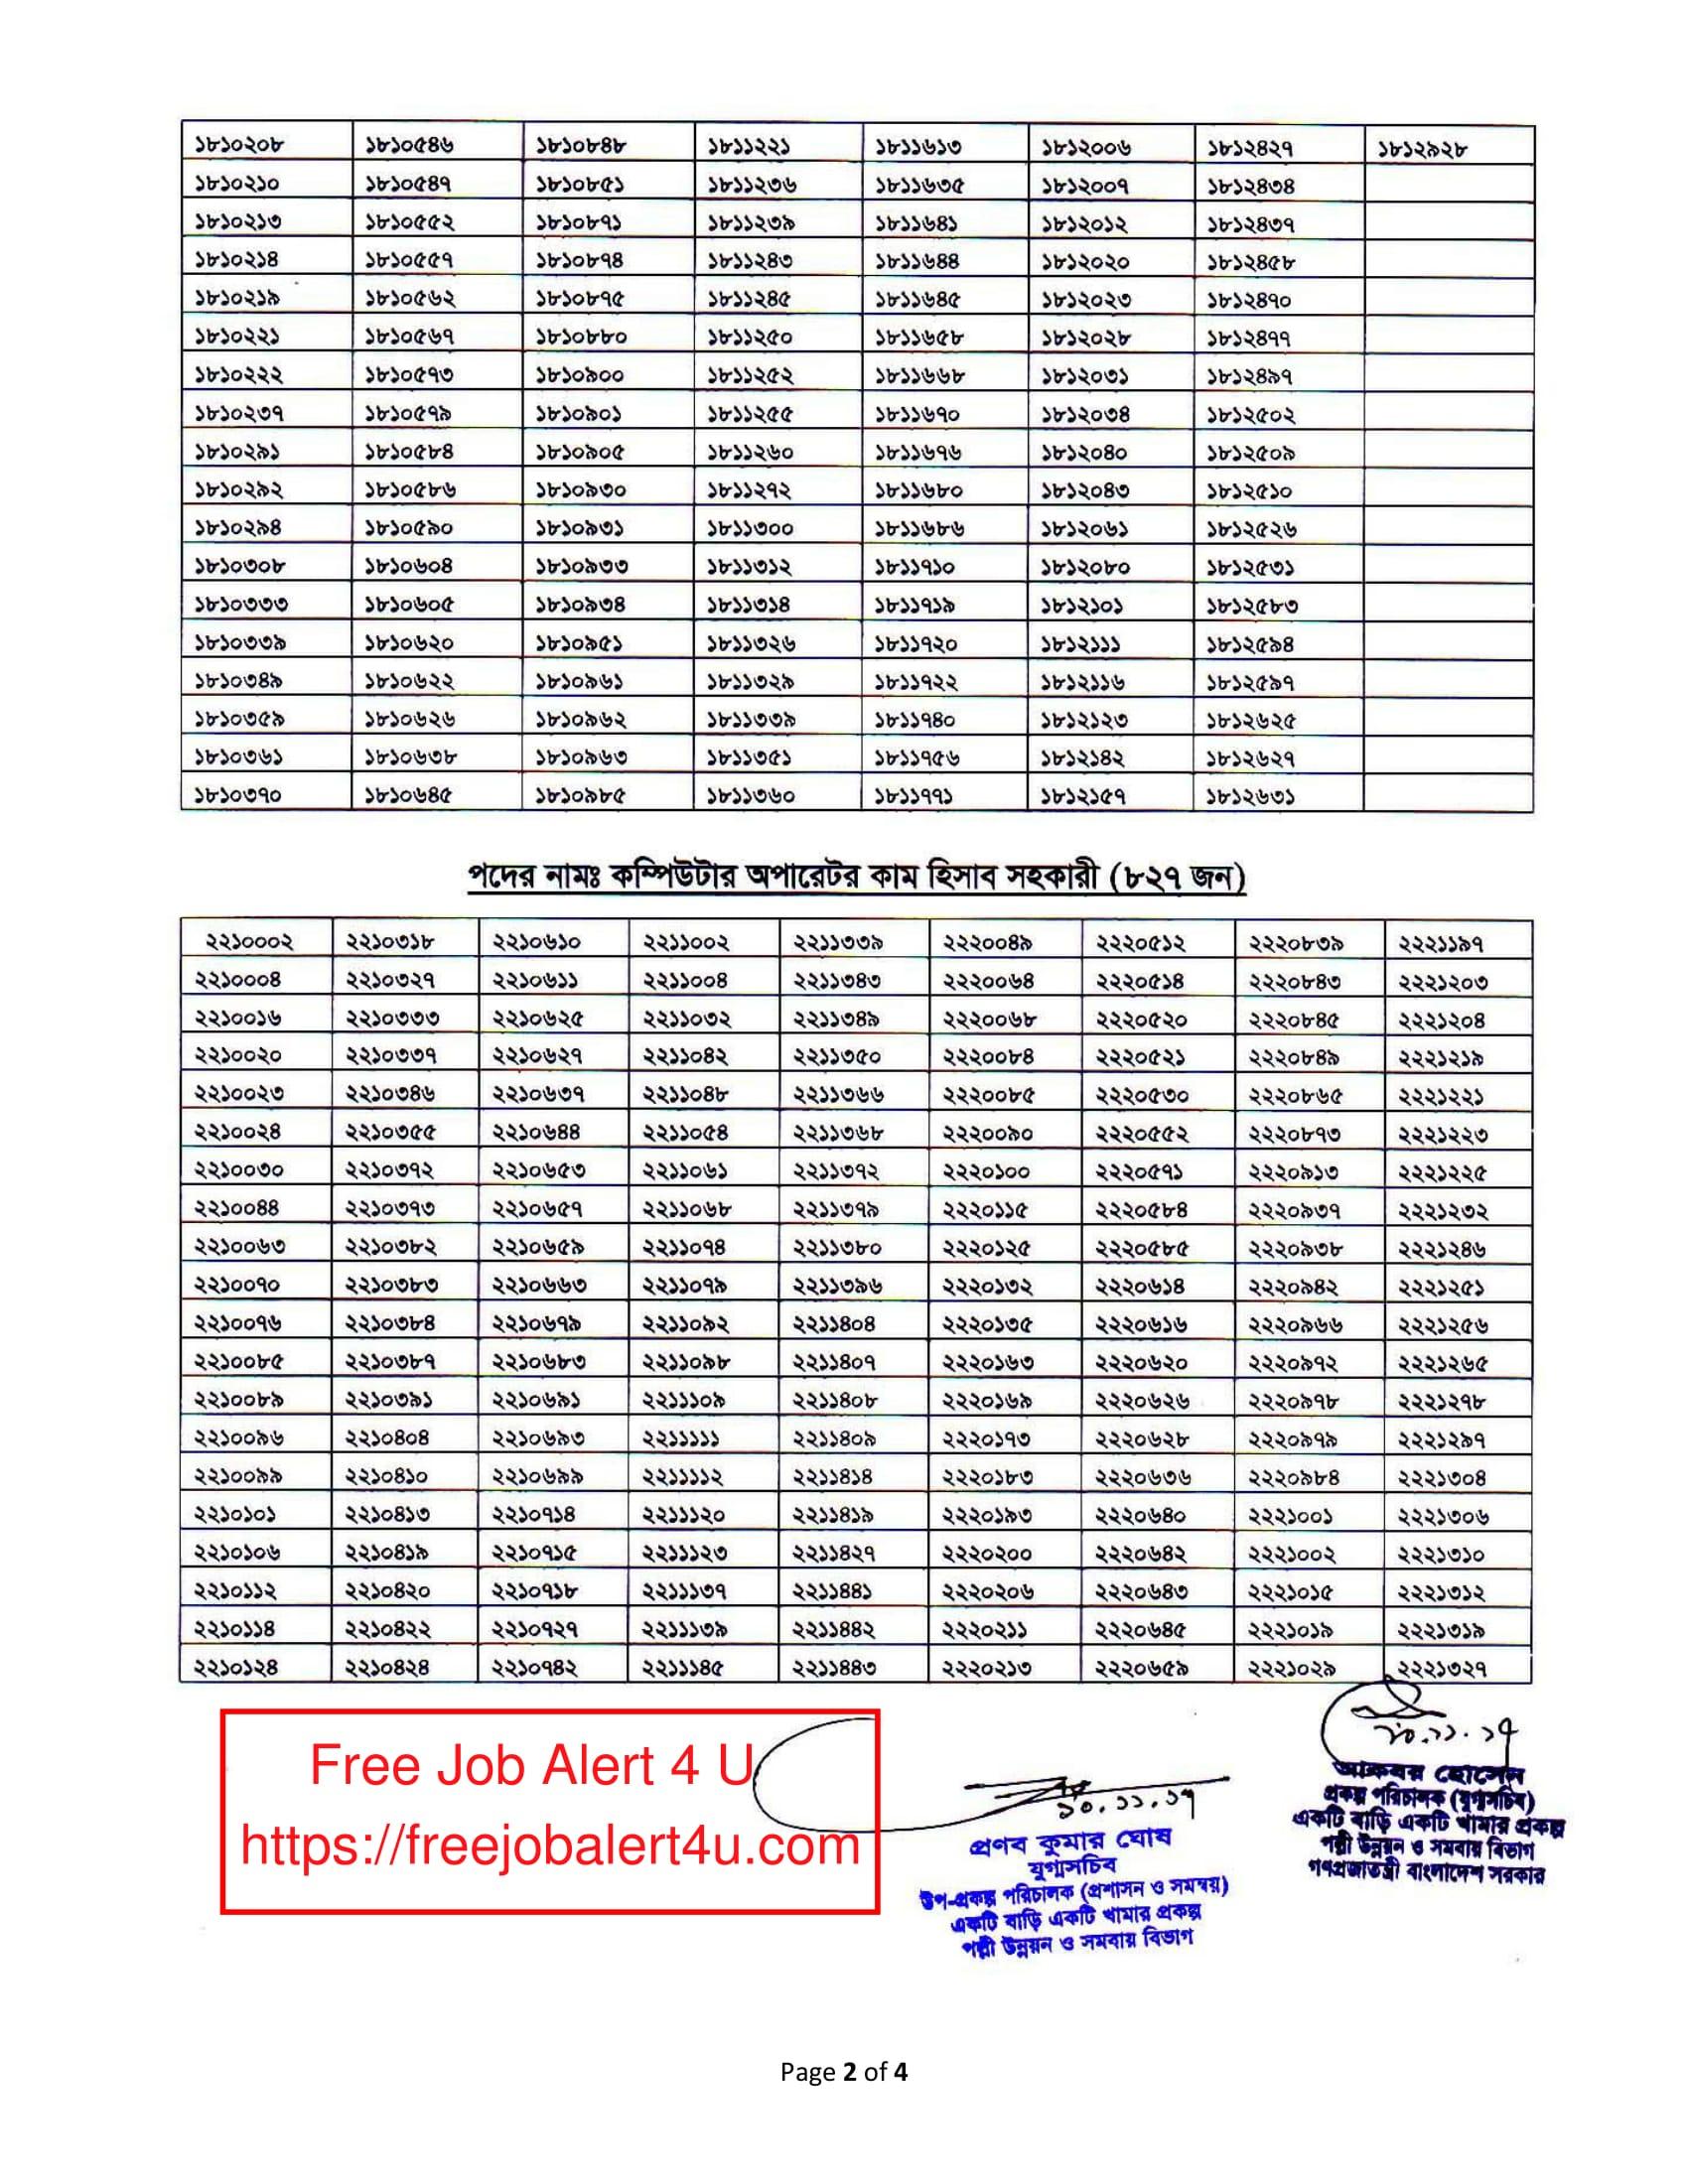 Ekti_bari_ekti_khamar_writen_exam_result_2